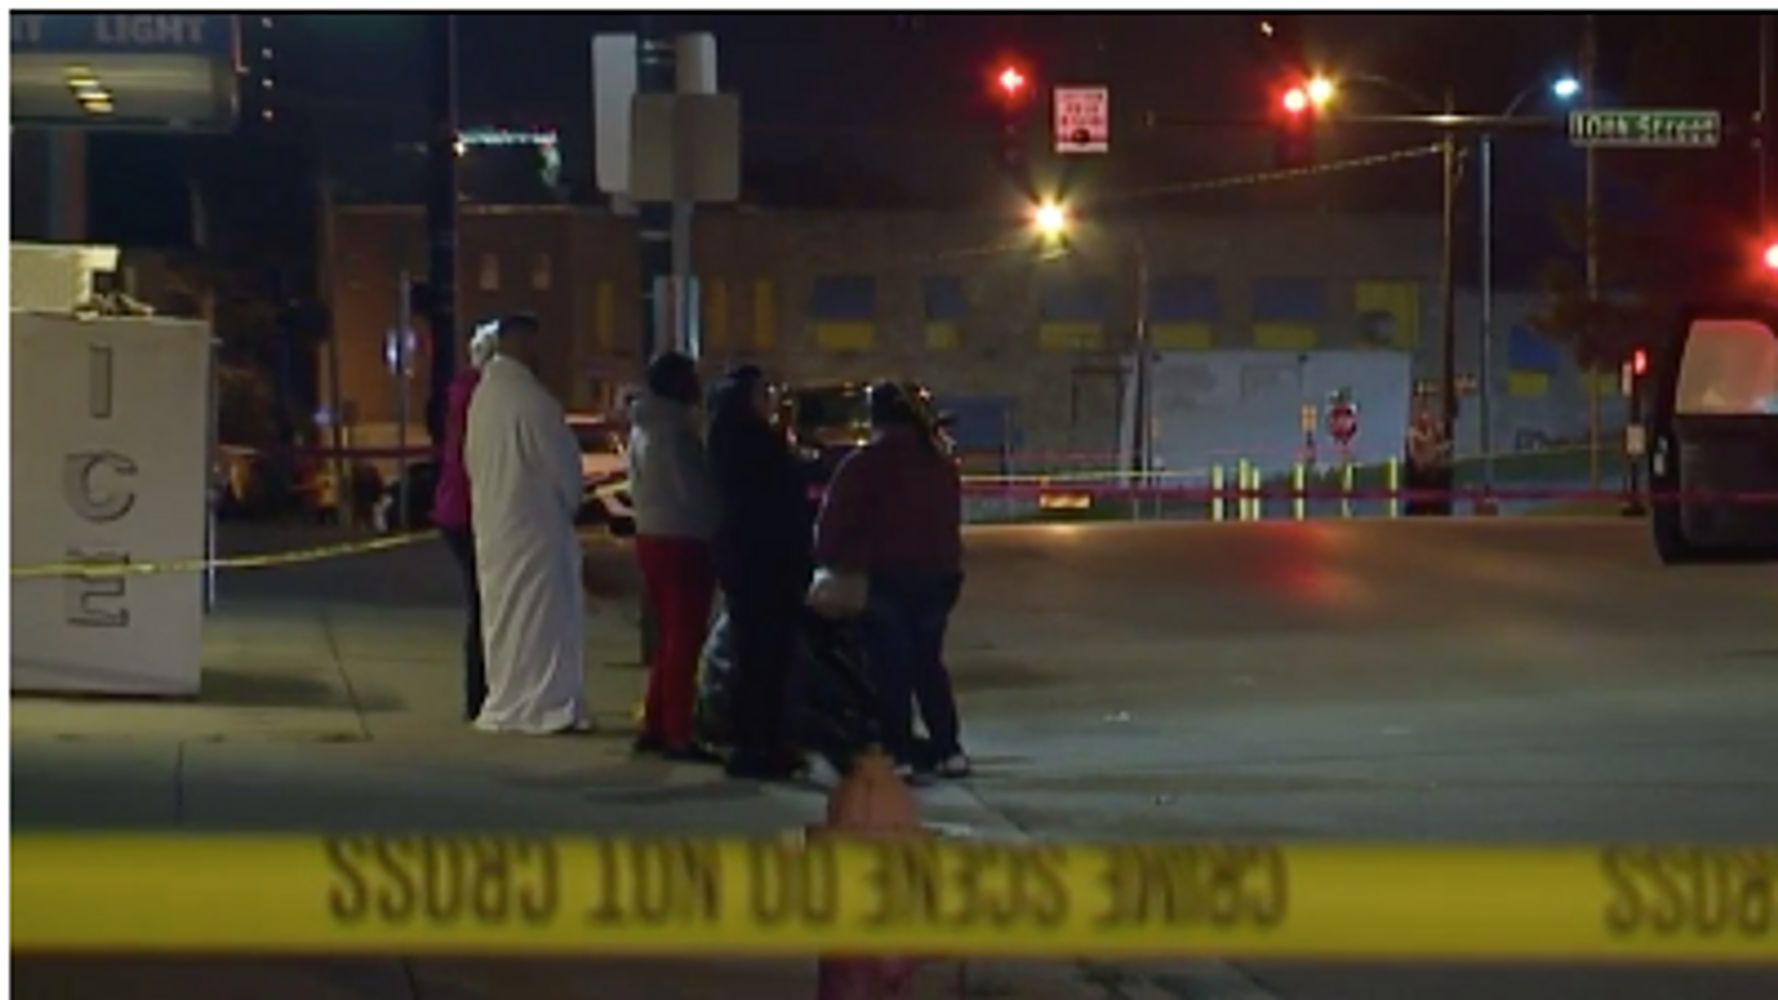 Westlake Legal Group 5d99df3e2100006601aab059 Kansas Bar Shooting Leaves 4 Dead, 5 Injured